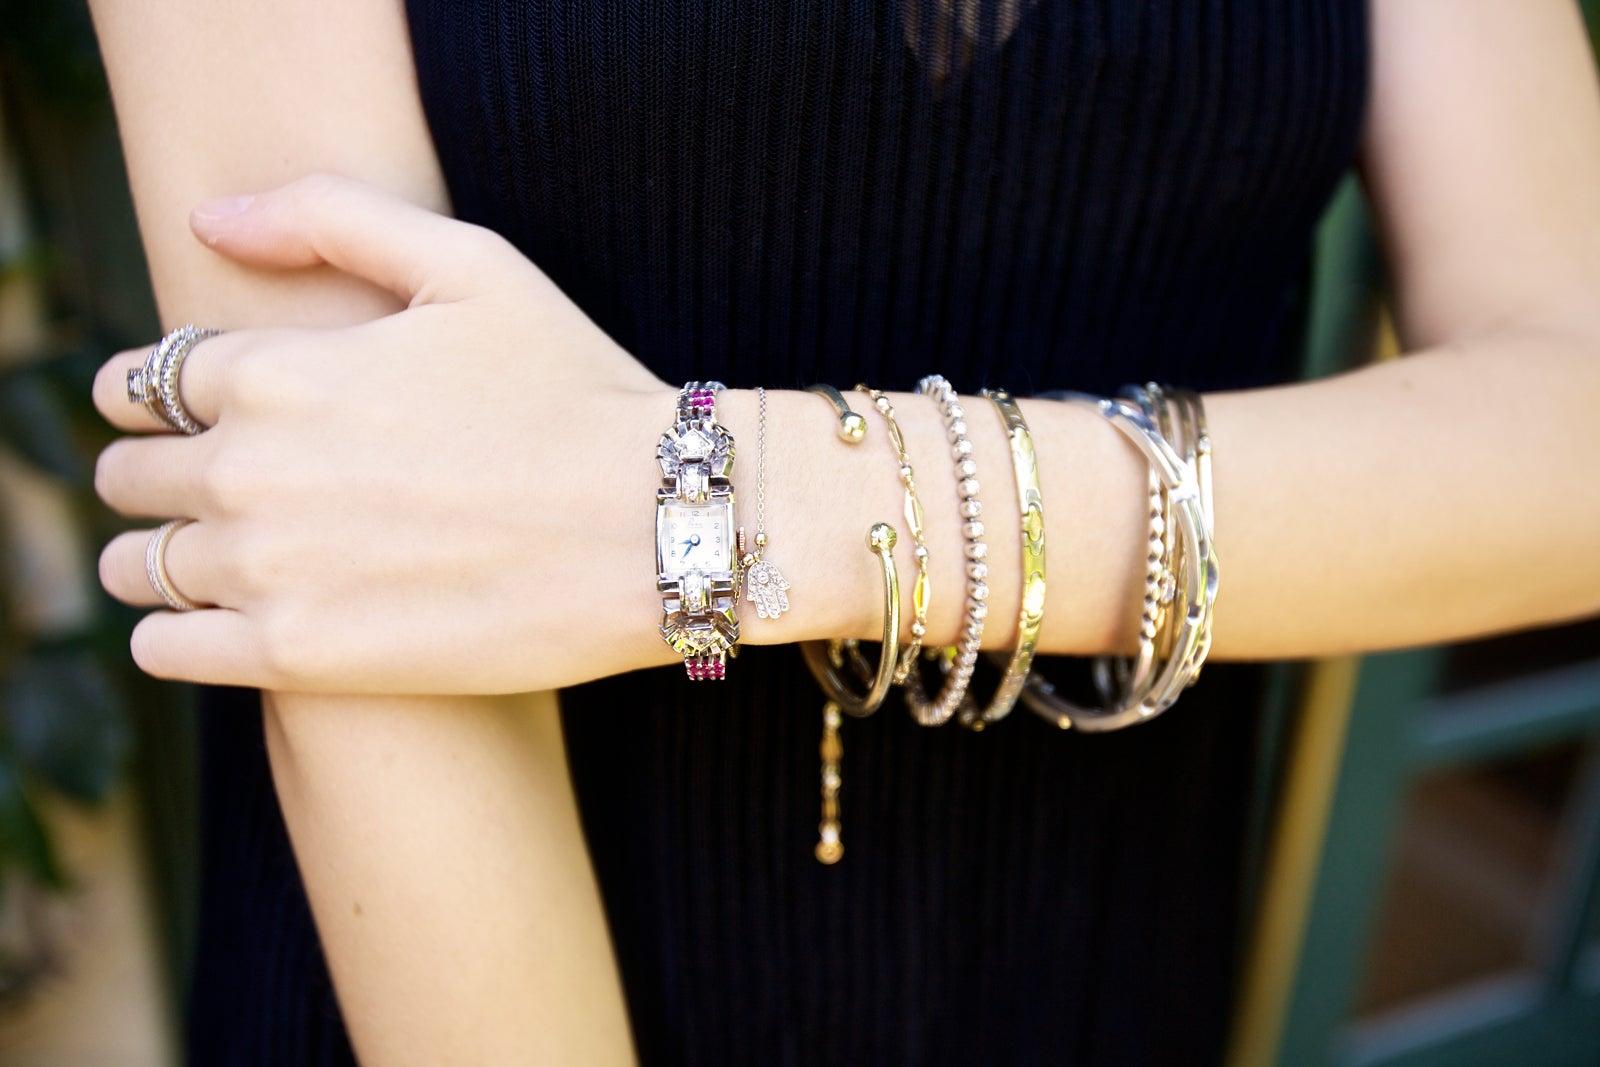 bracelet on wrist - photo #26